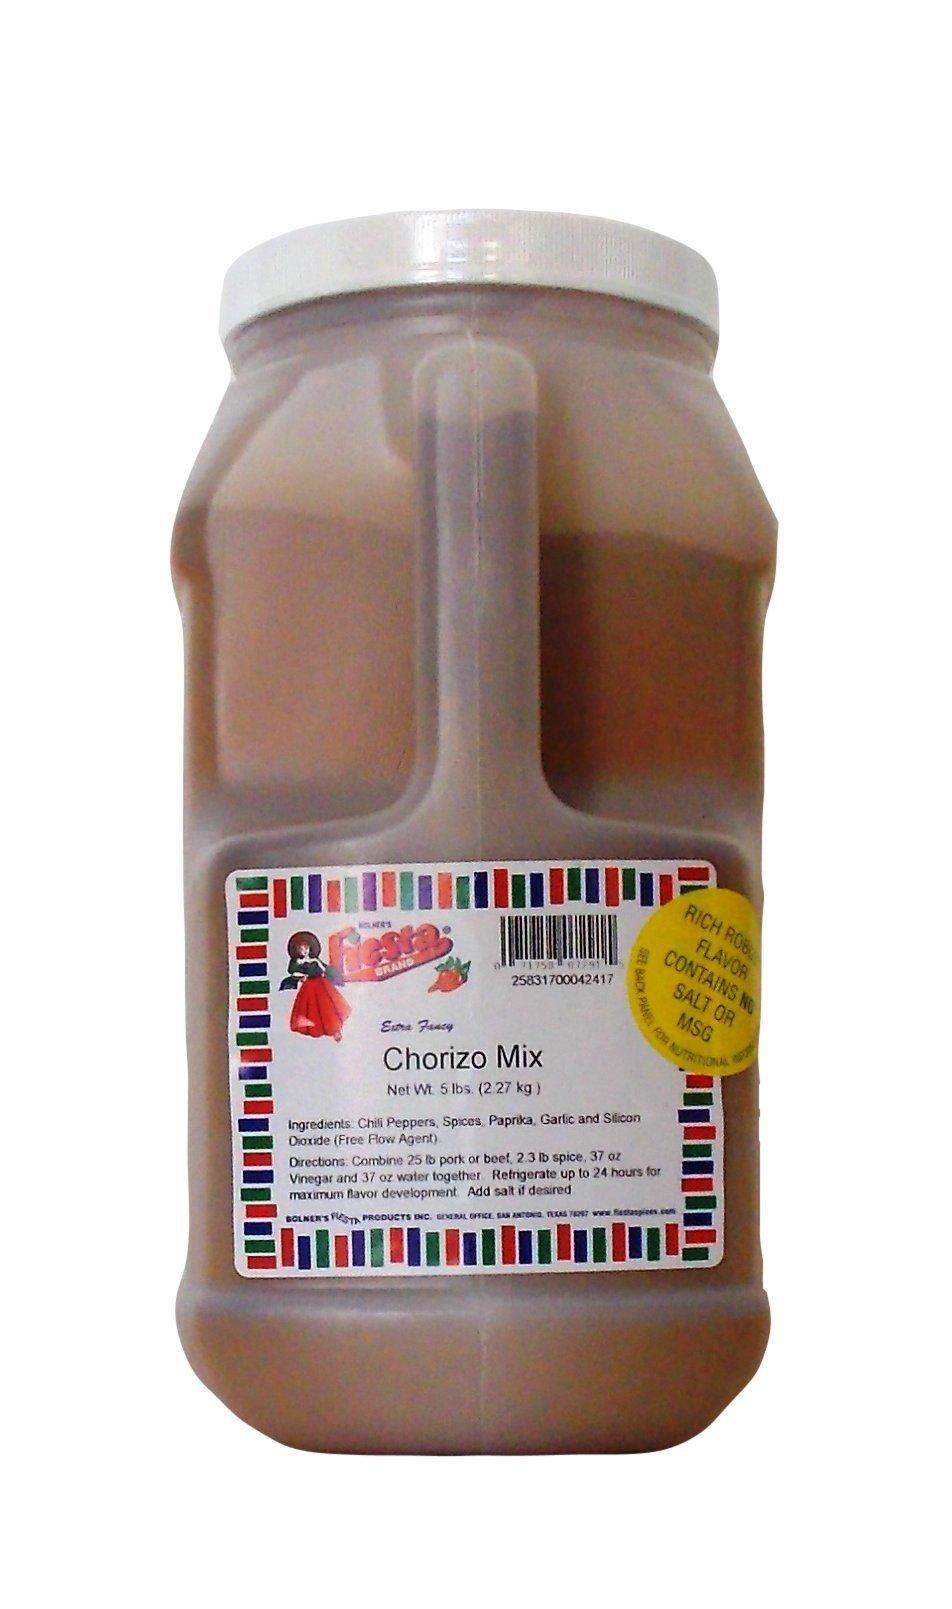 Bolner's Fiesta Extra Fancy Salt Free Chorizo Mix, 5 Lb.